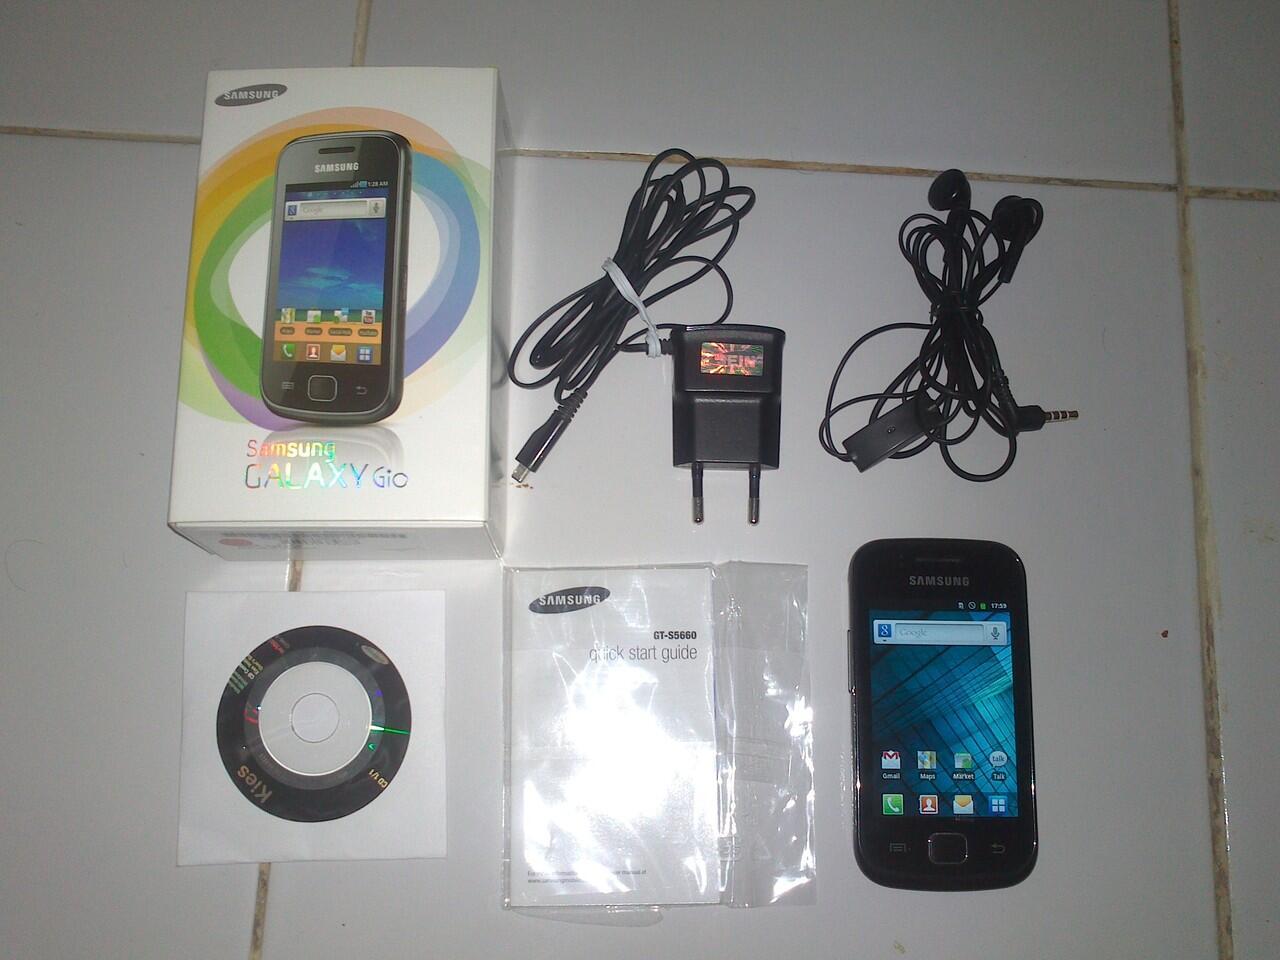 Djual Samsung Galaxy Gio GT-S5660 [MULUS]